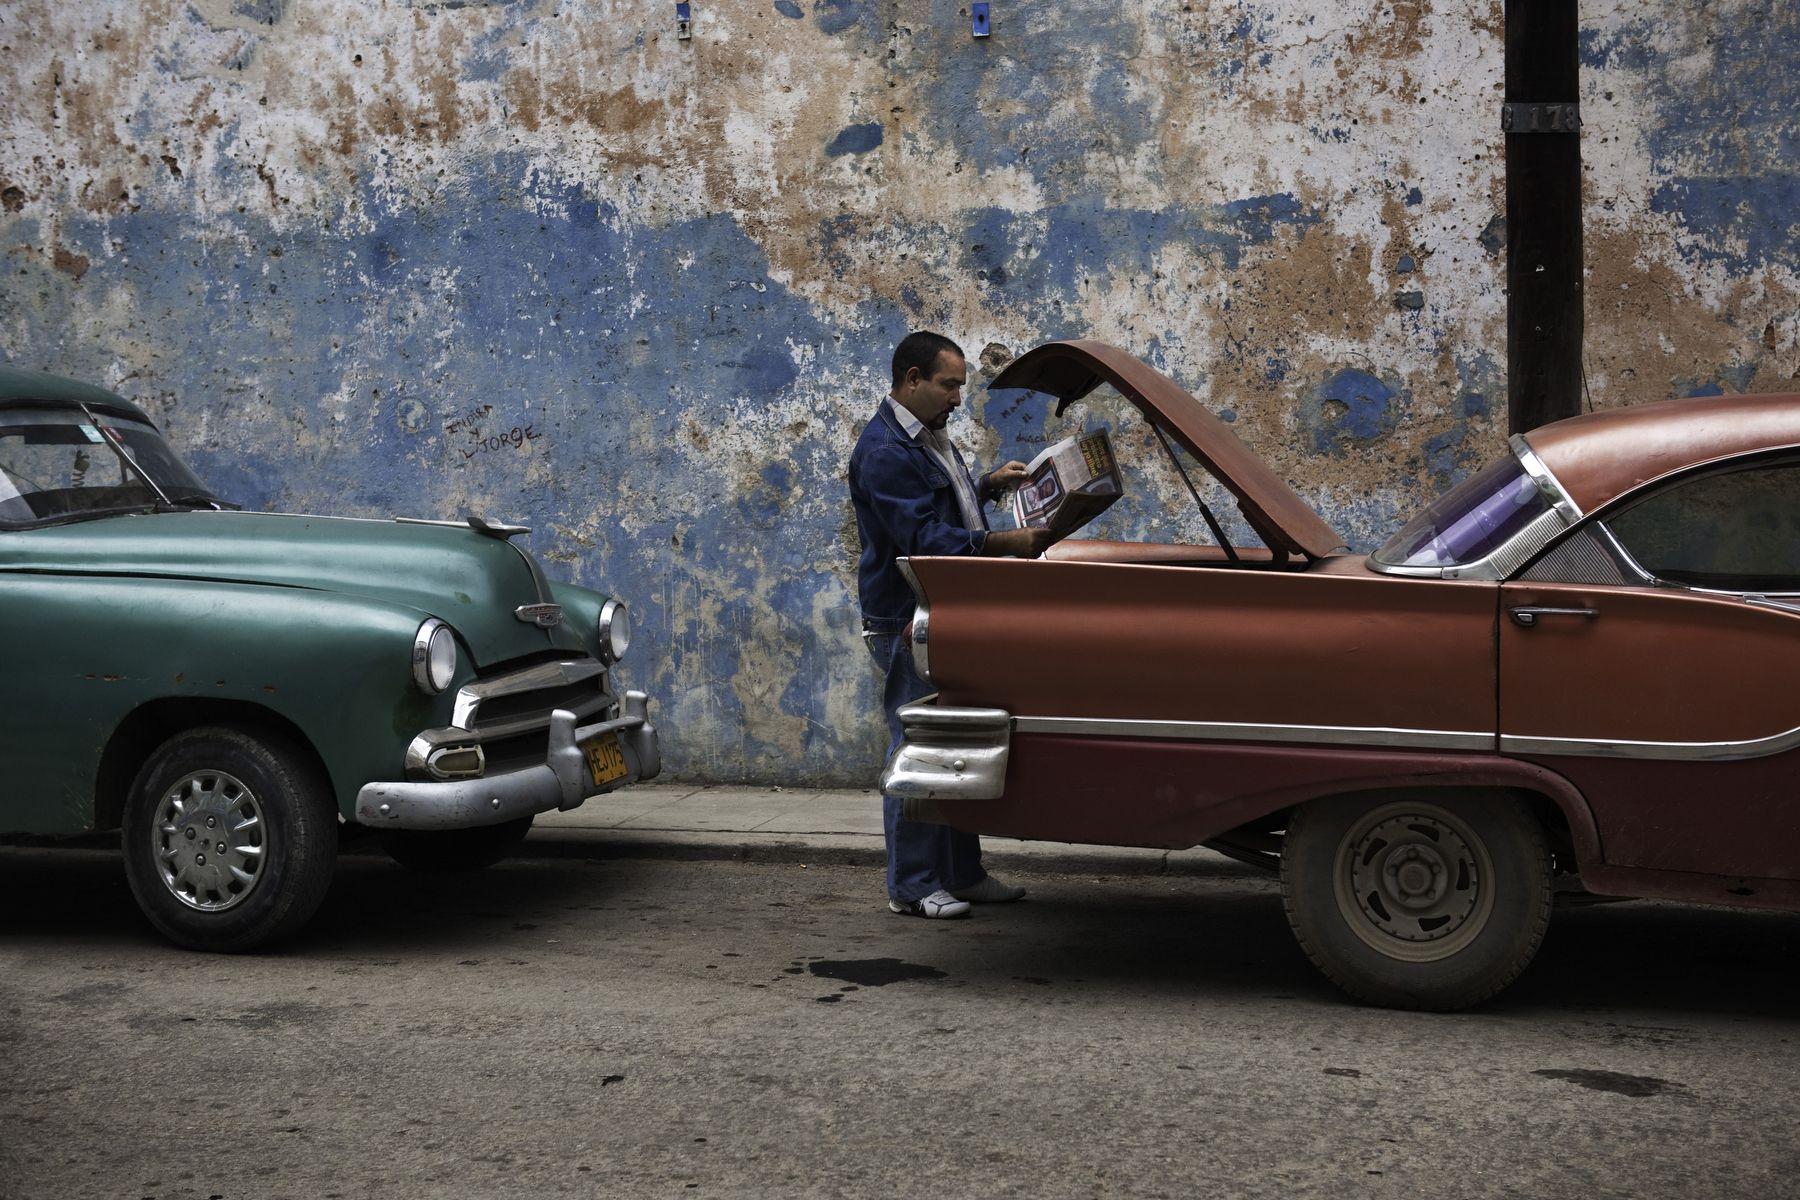 Wall to Wall | Steve McCurry